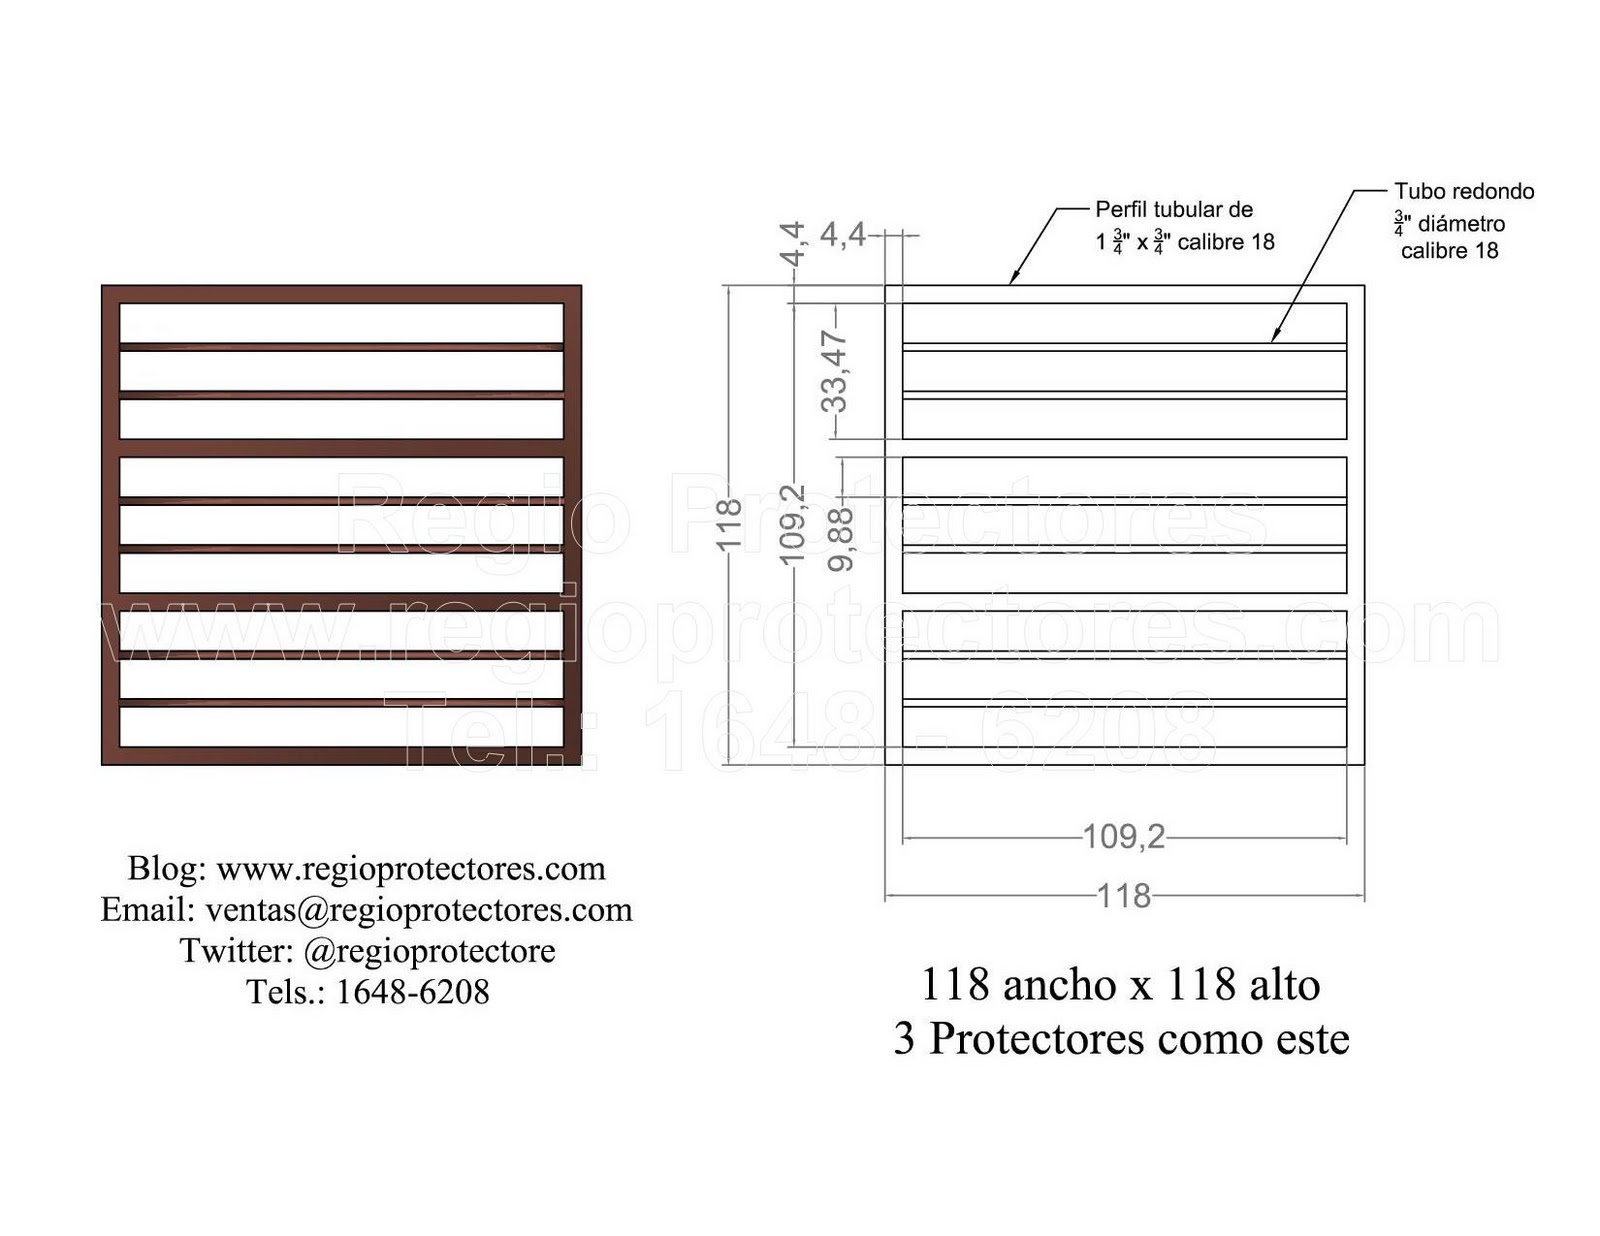 Diseño de protector para ventana contemporáneo, Col. Roma, Plano de